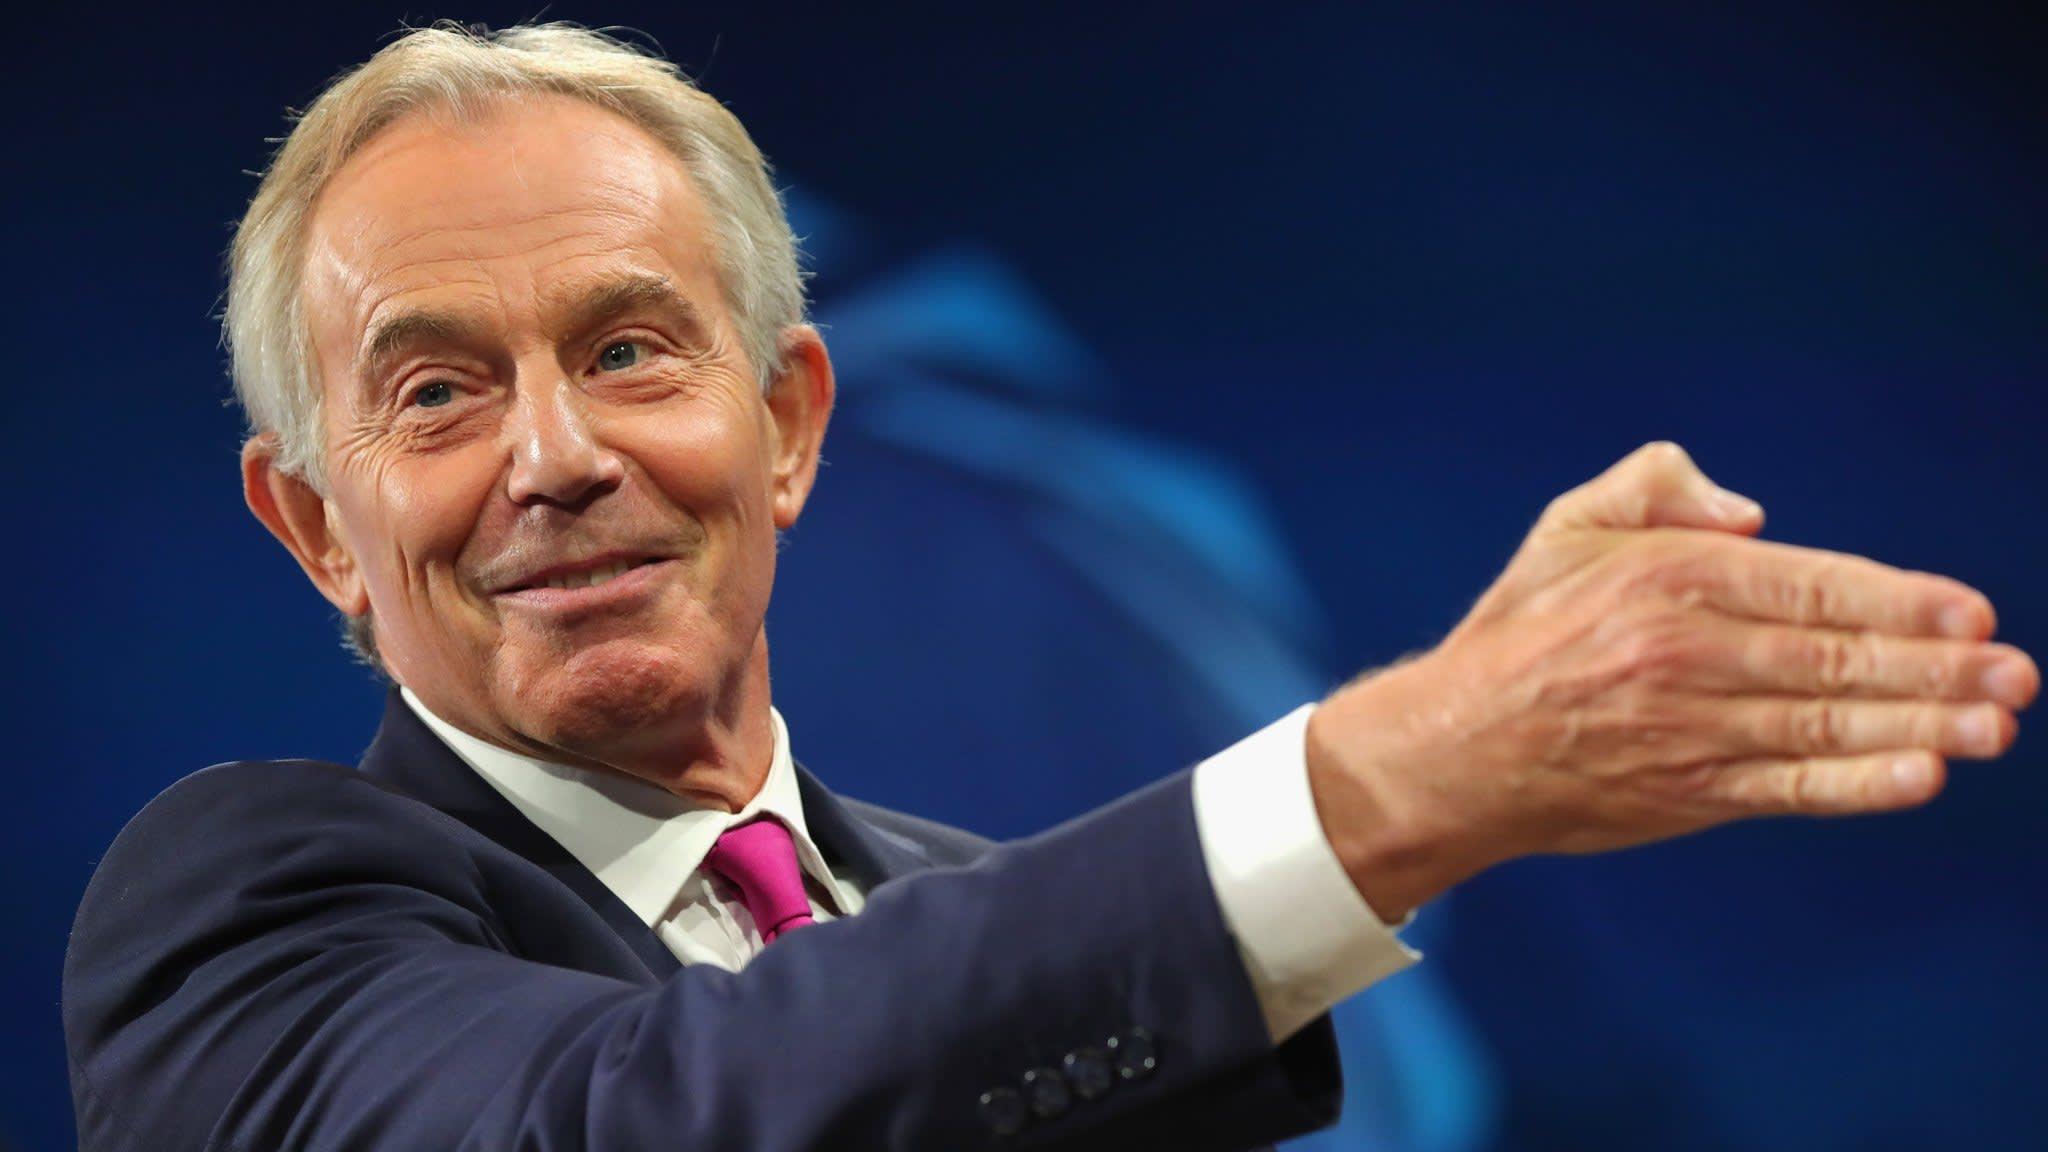 Tony Blair Institute confirms donations from Saudi Arabia